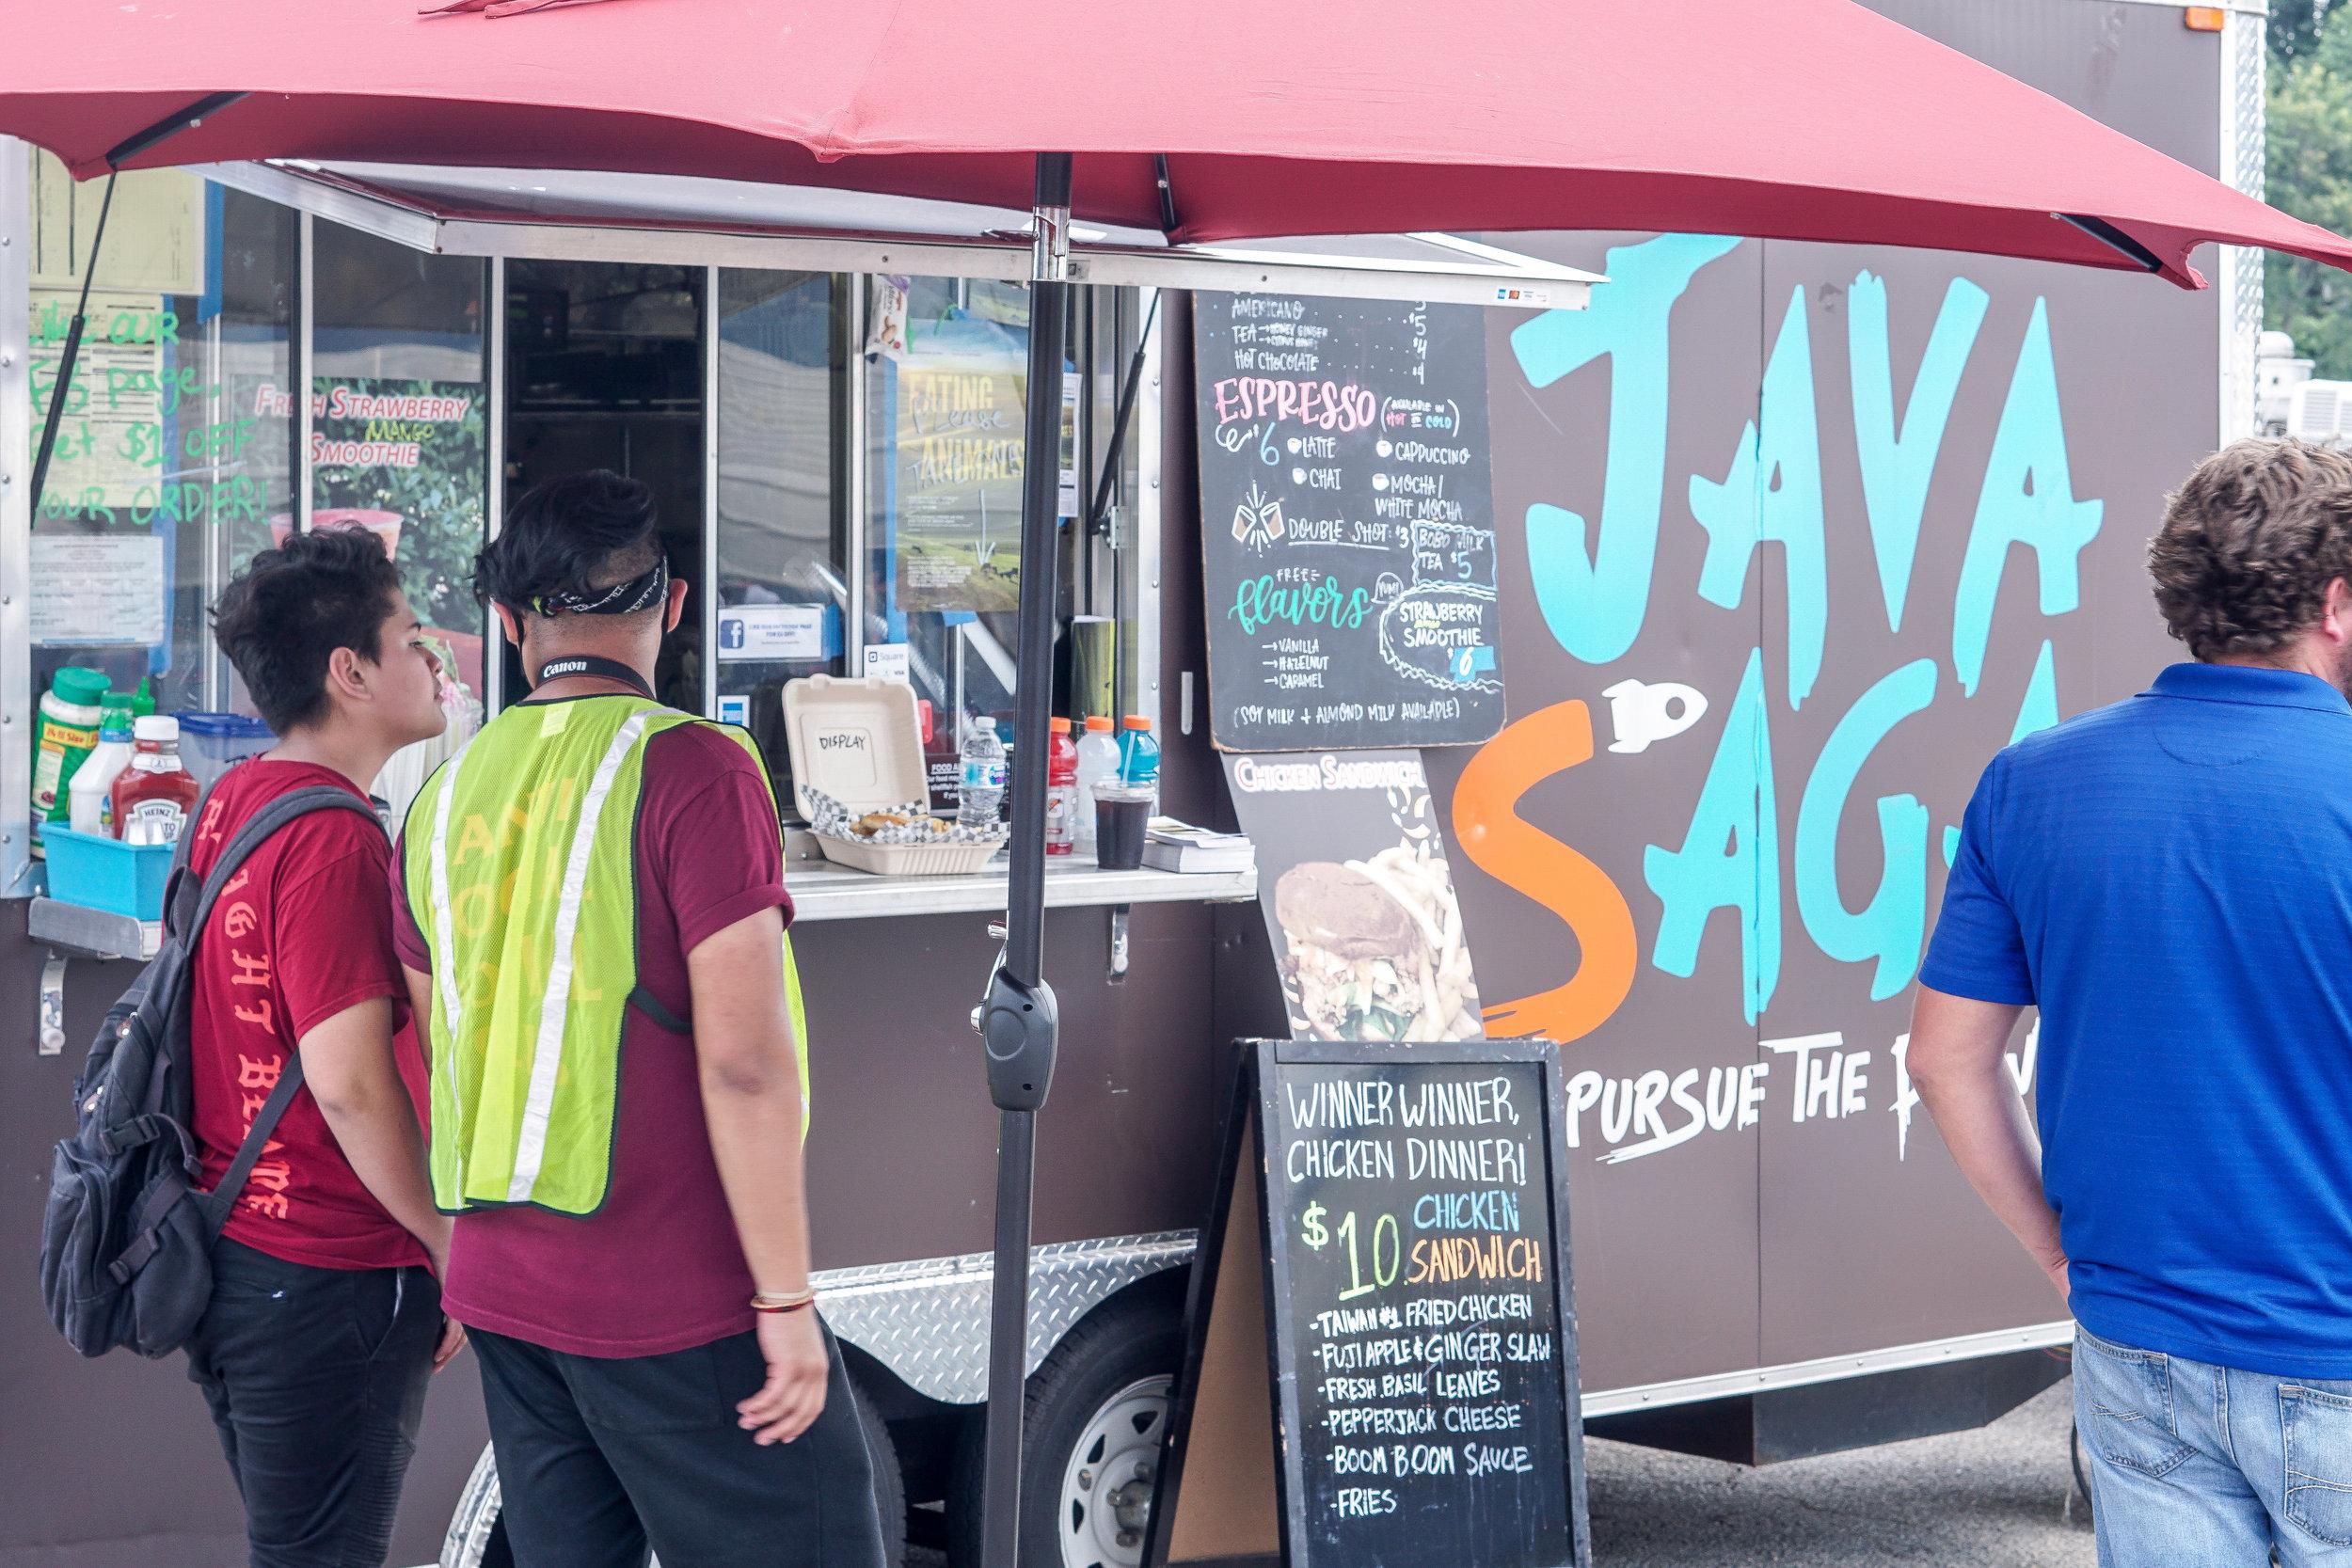 The Java Saga food truck.